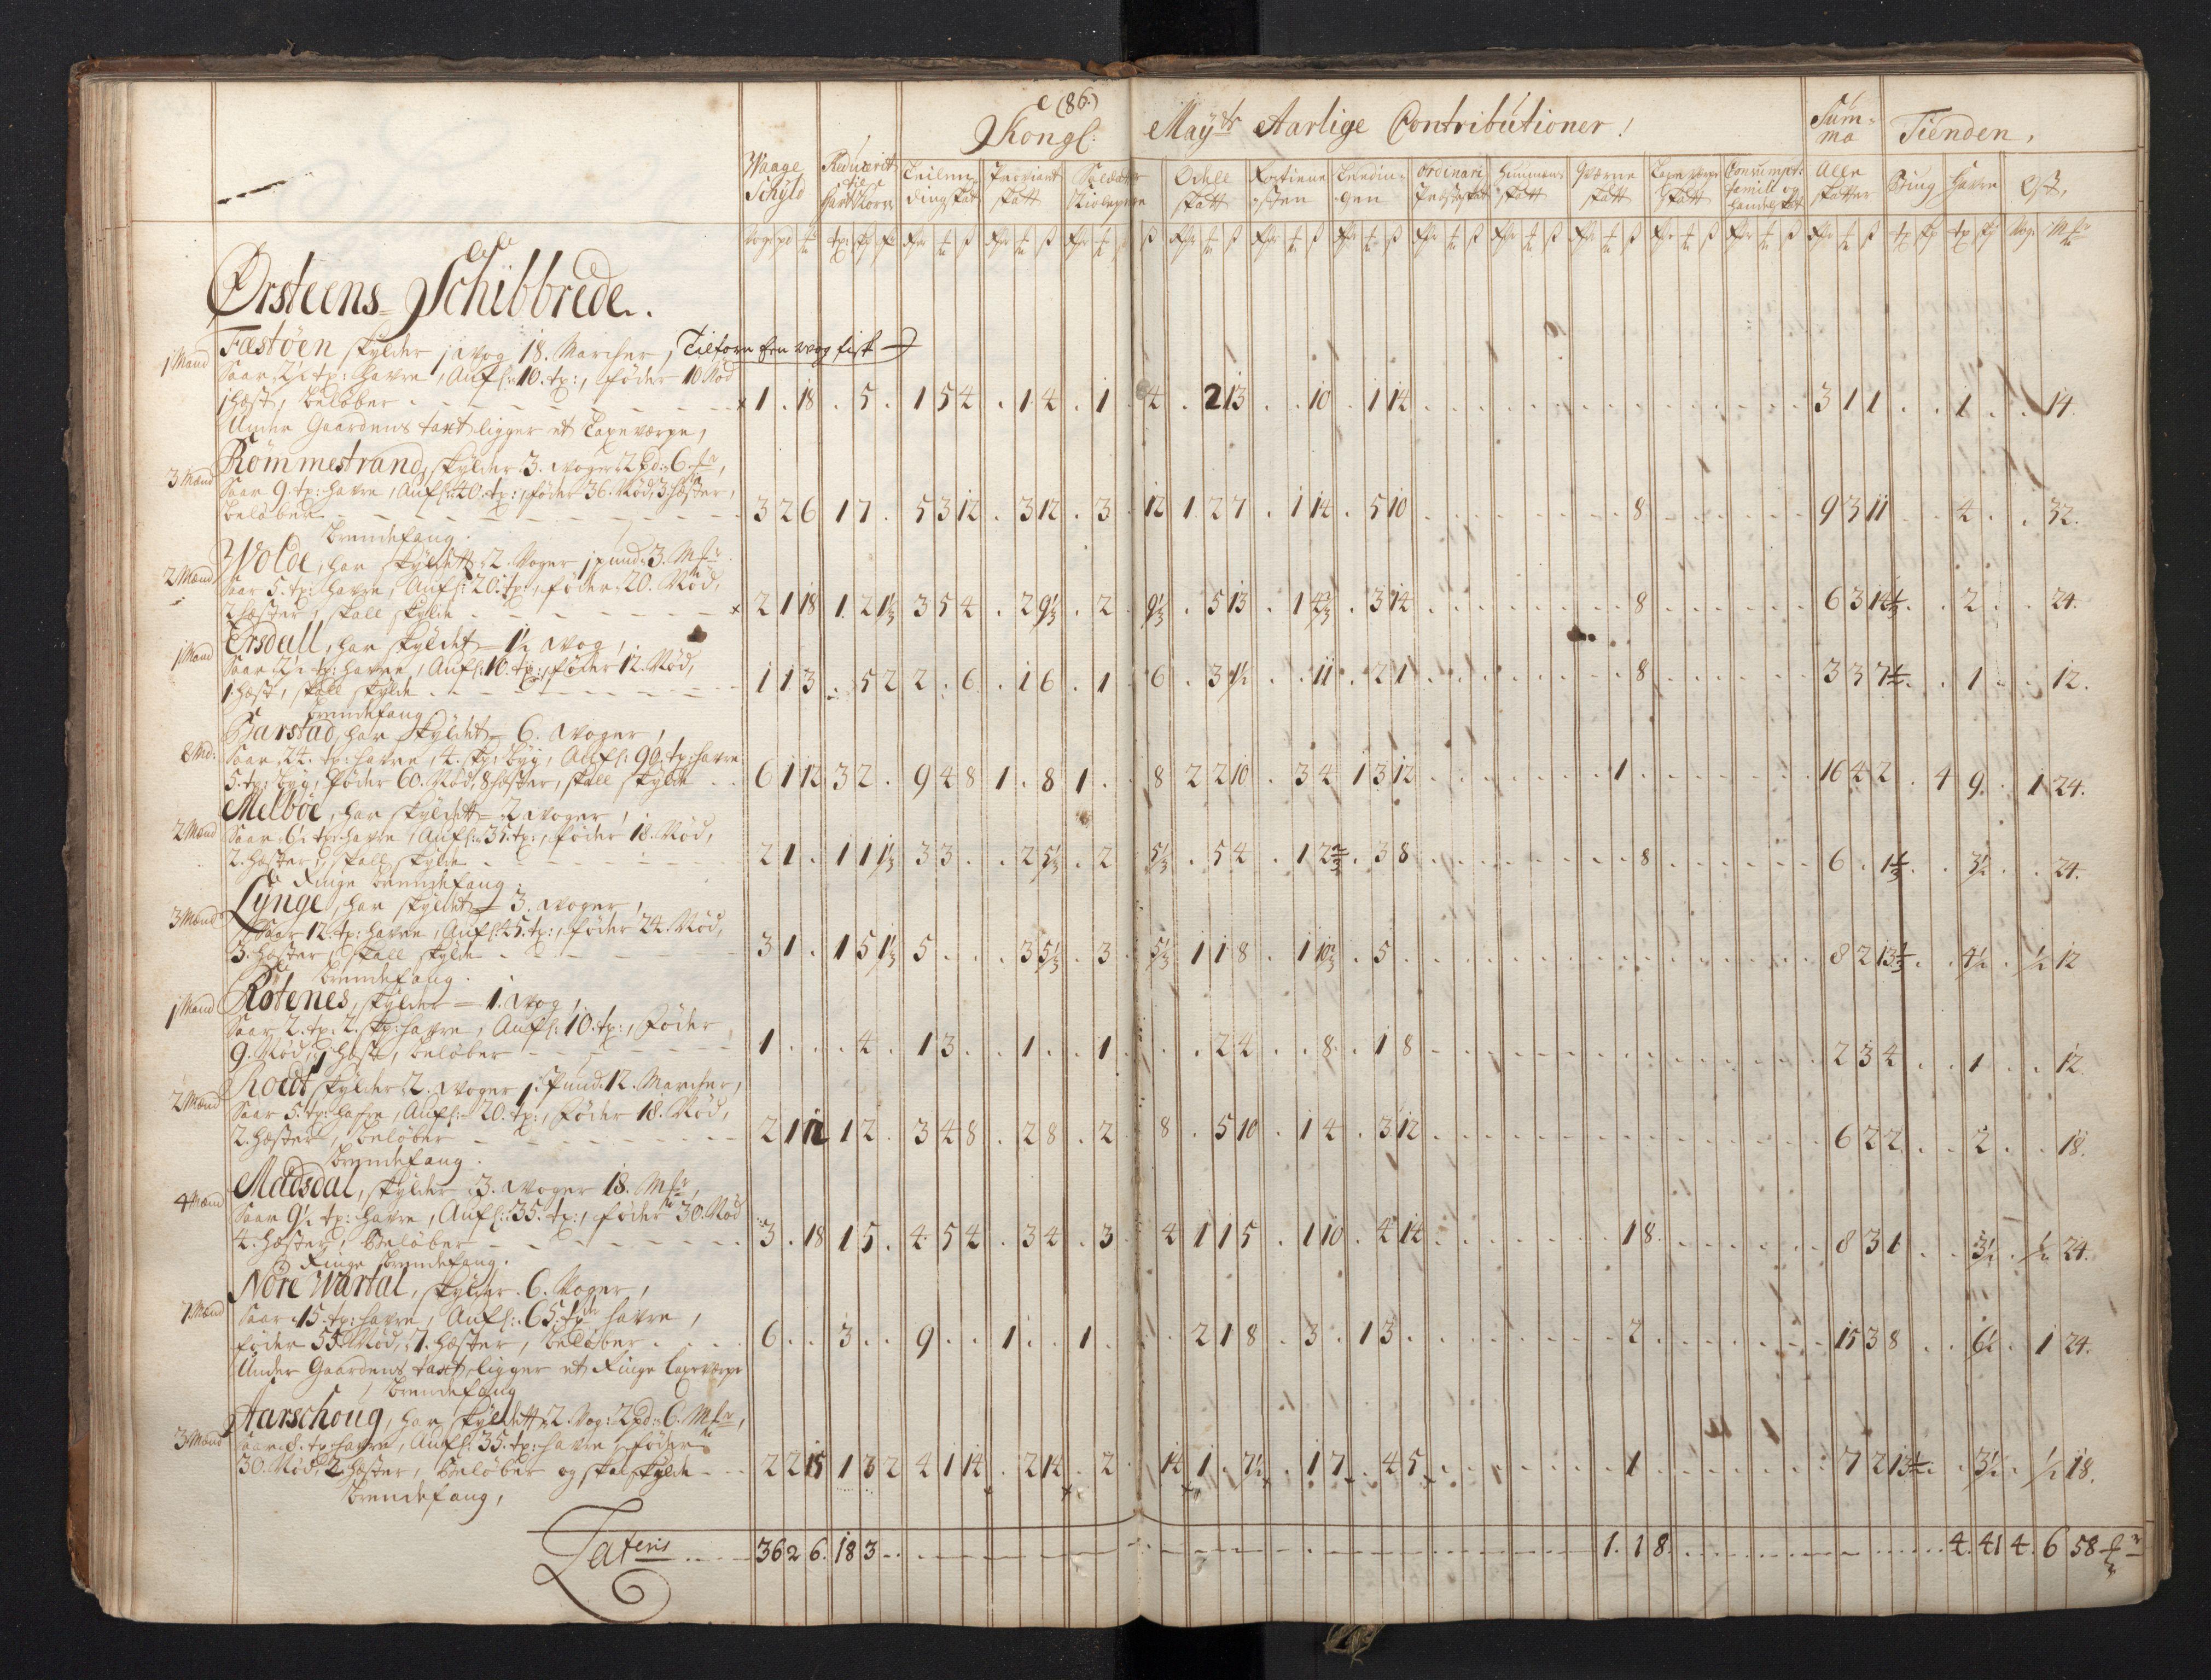 RA, Rentekammeret inntil 1814, Realistisk ordnet avdeling, N/Nb/Nbf/L0149: Sunnmøre, prøvematrikkel, 1714, s. 85b-86a